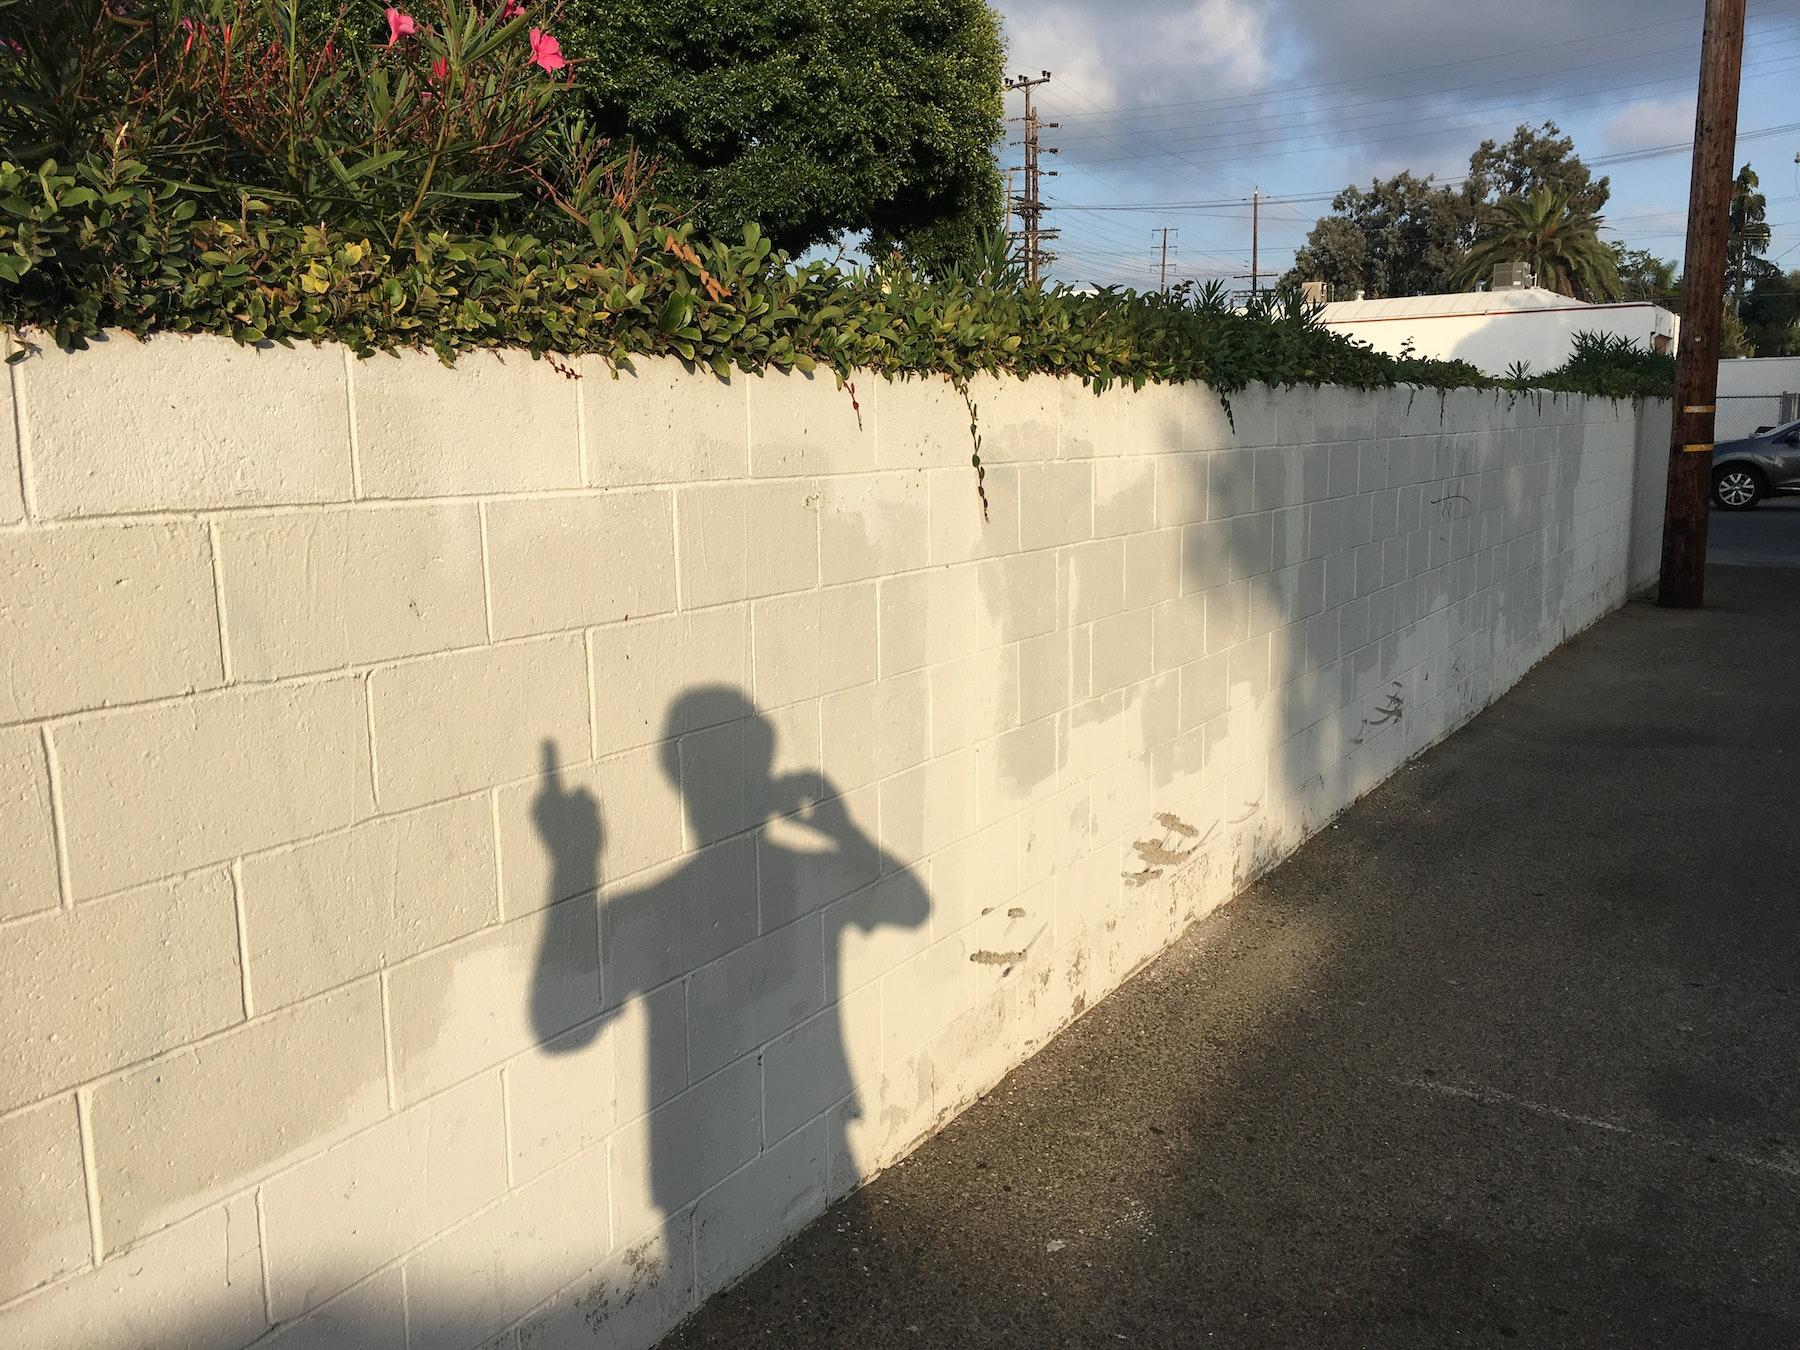 man_shadow_1